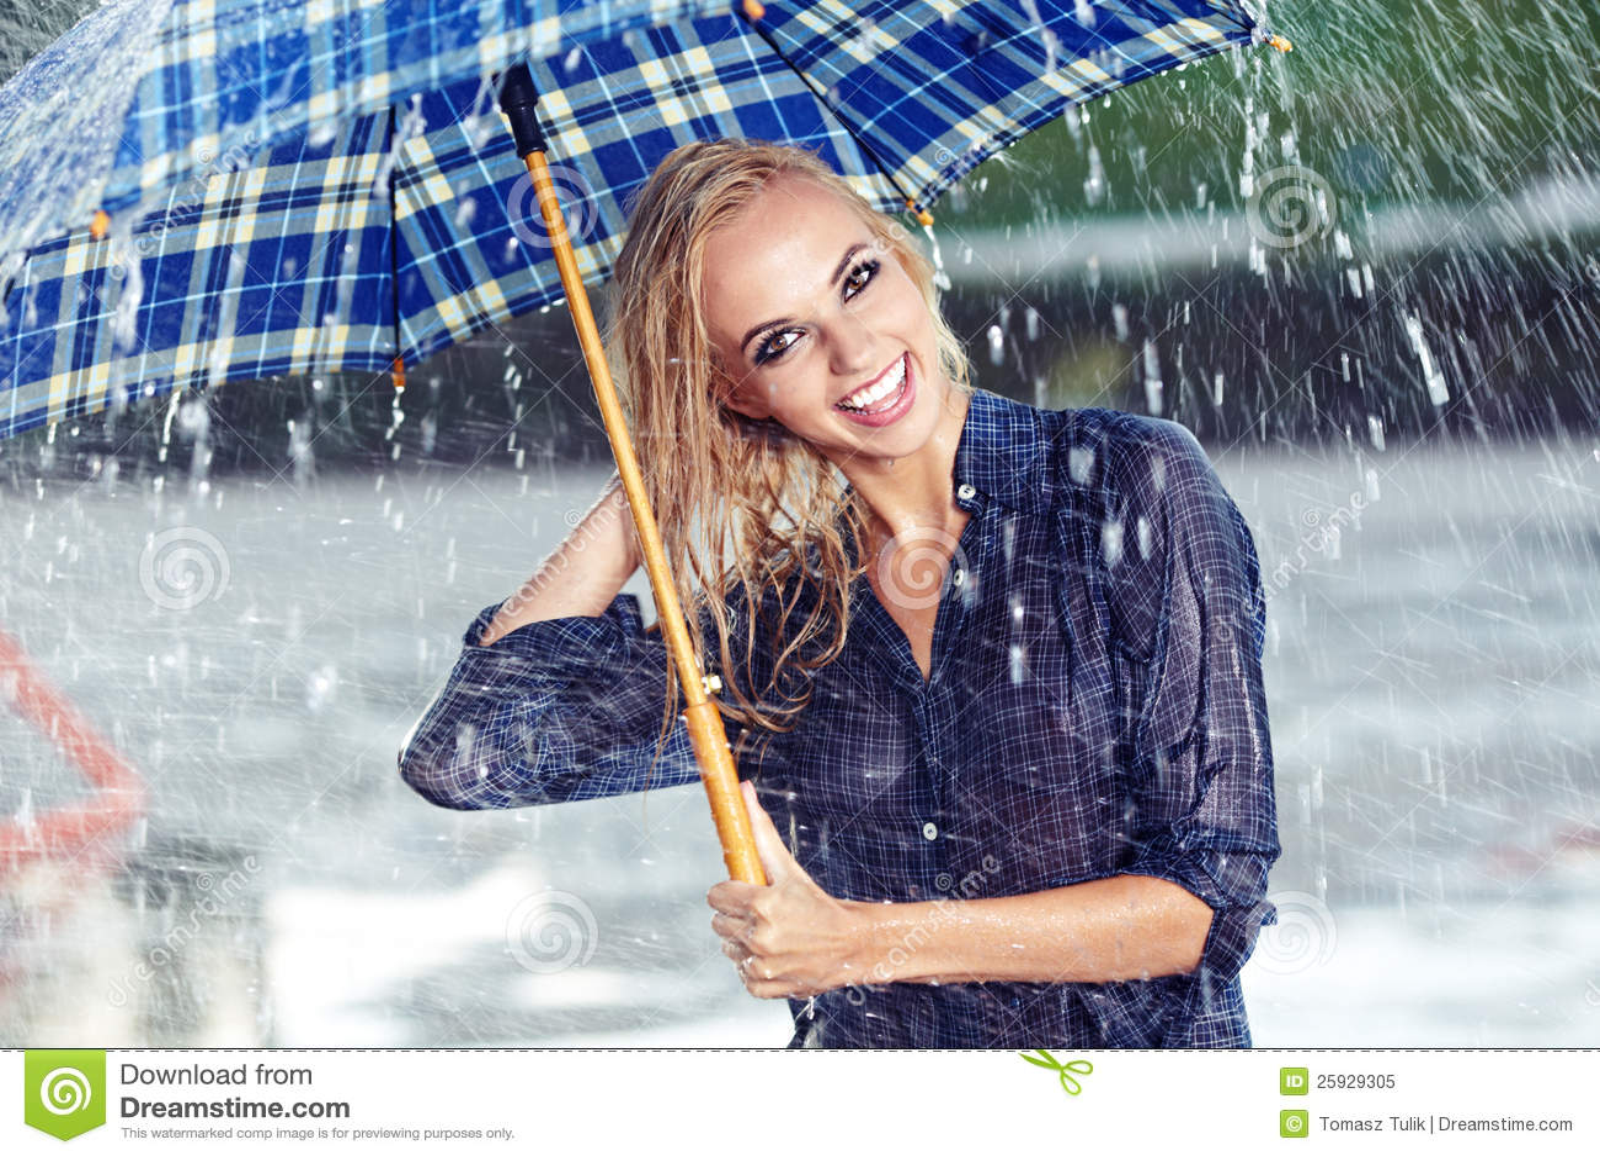 Girl Under Umbrella Watching The Rain Royalty Free Stock